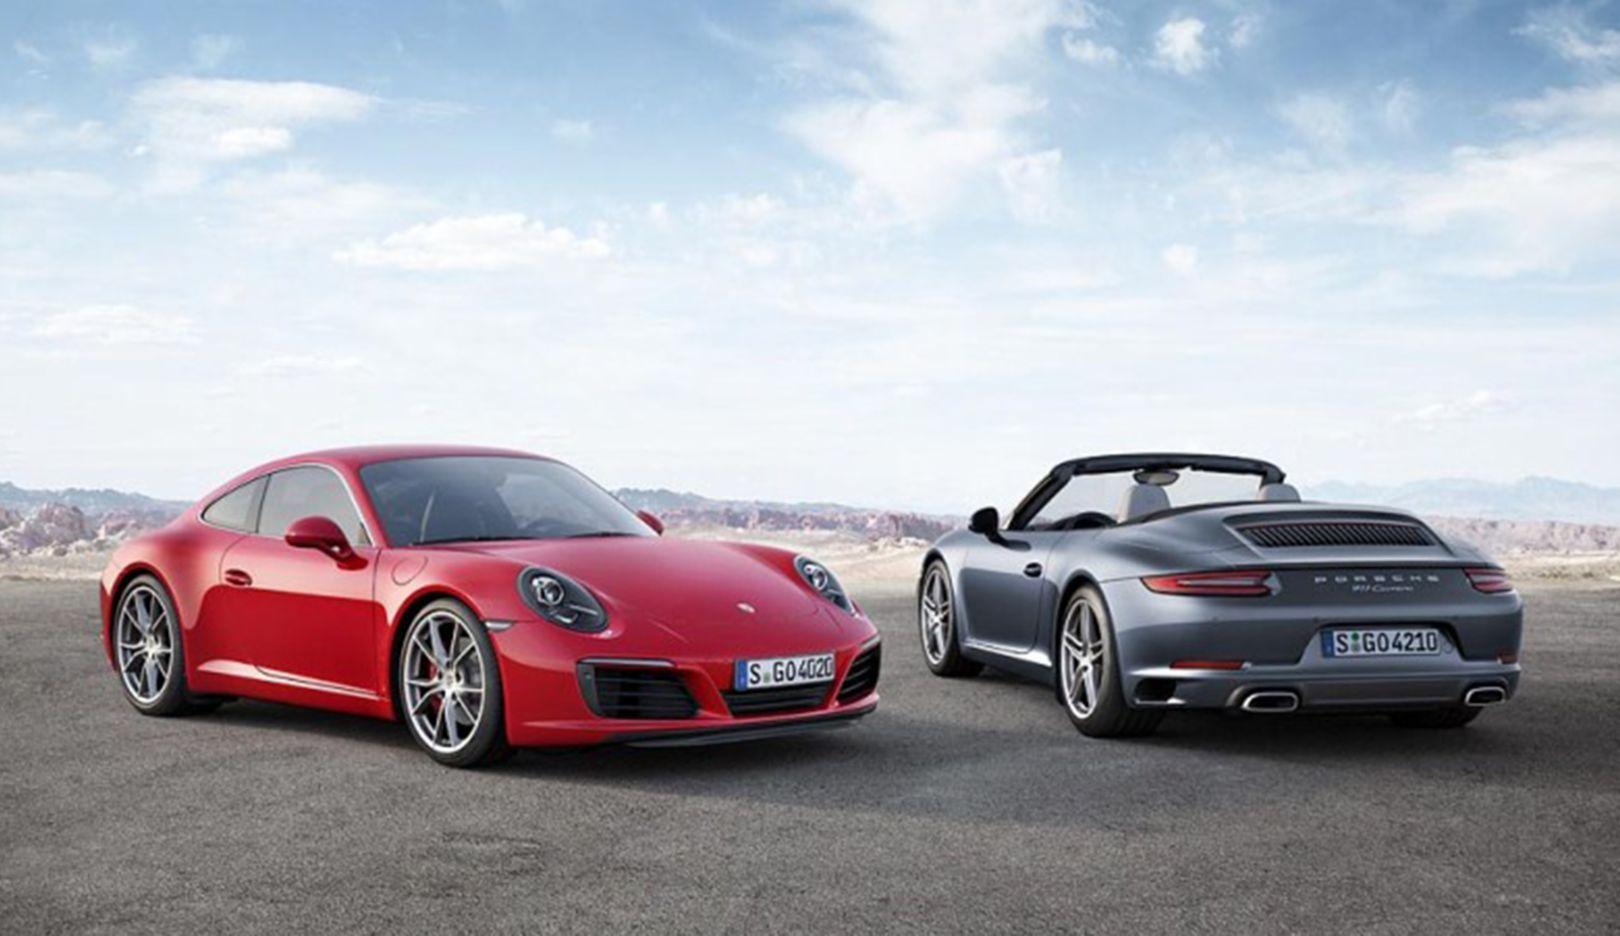 New Porsche 911 >> The New Porsche 911 Carrera